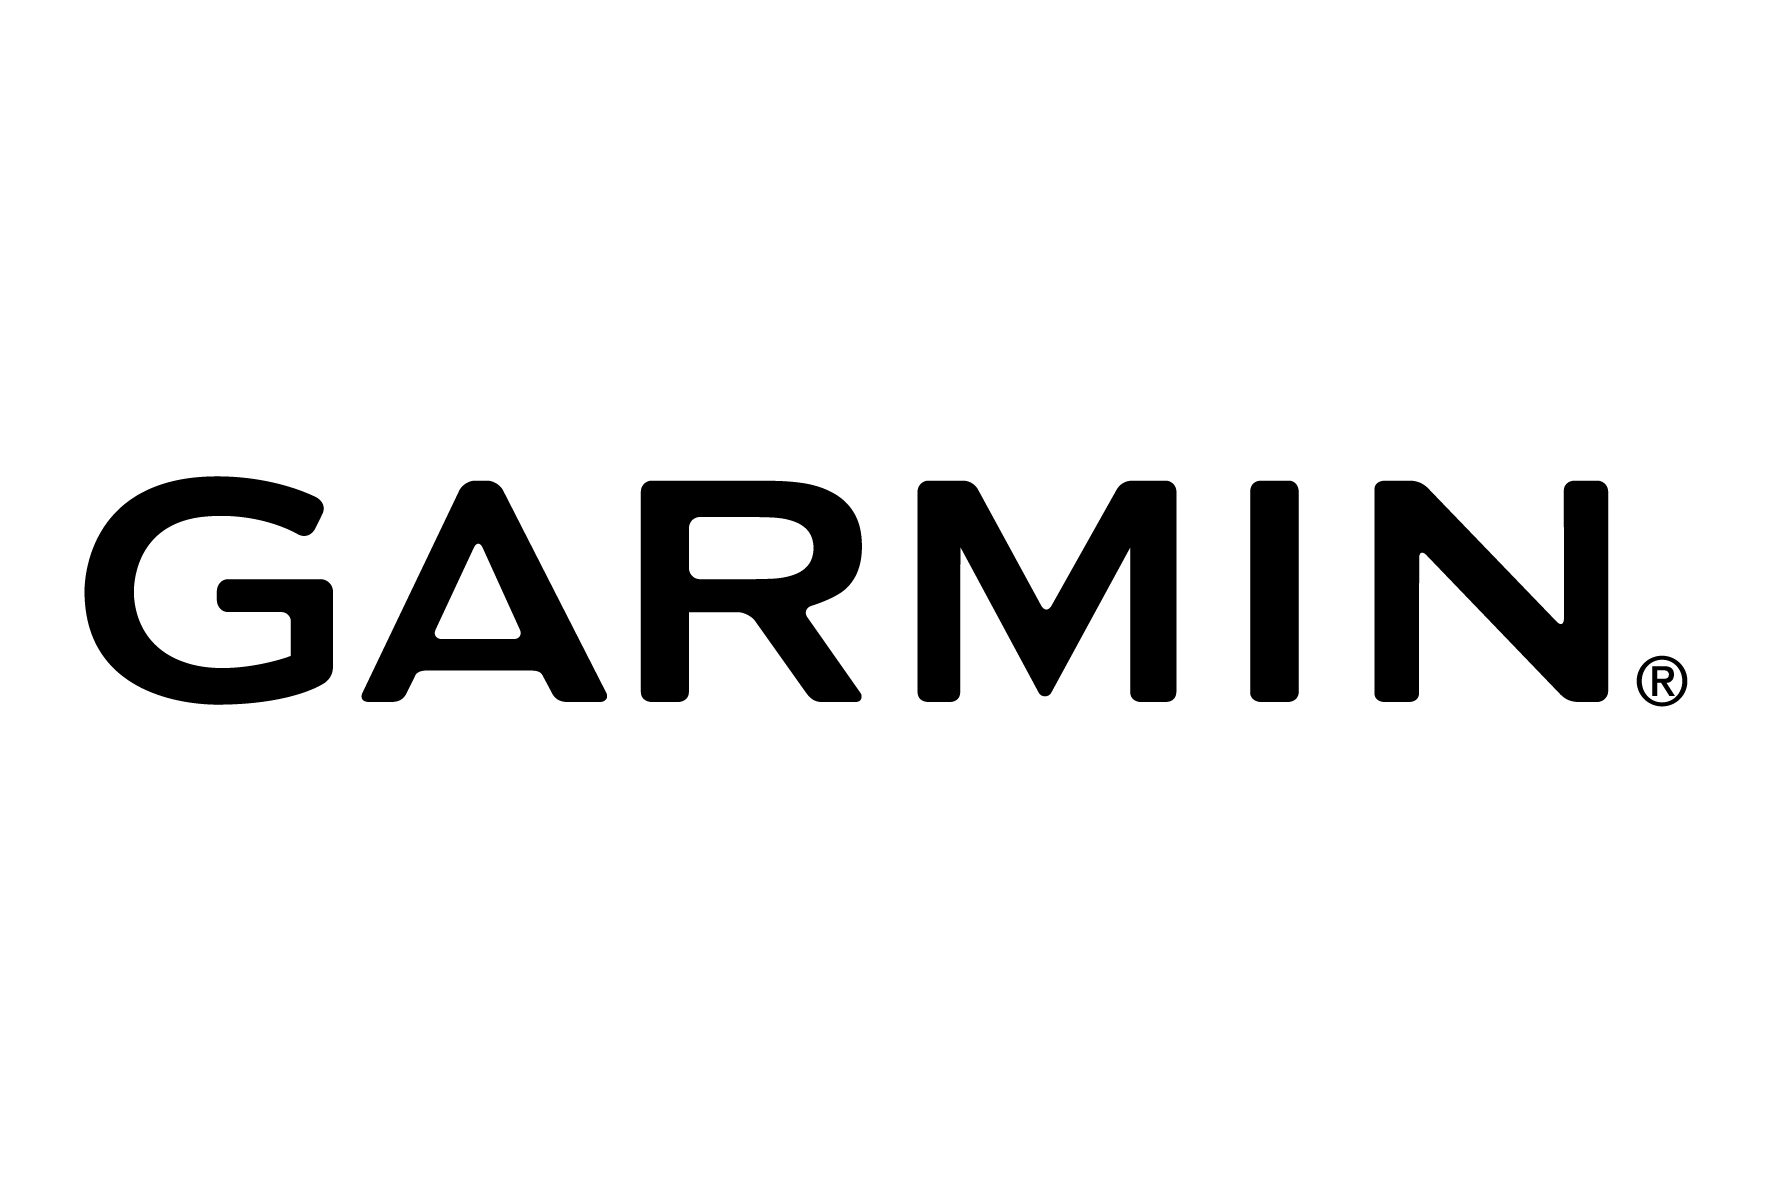 LFM group logo garmin